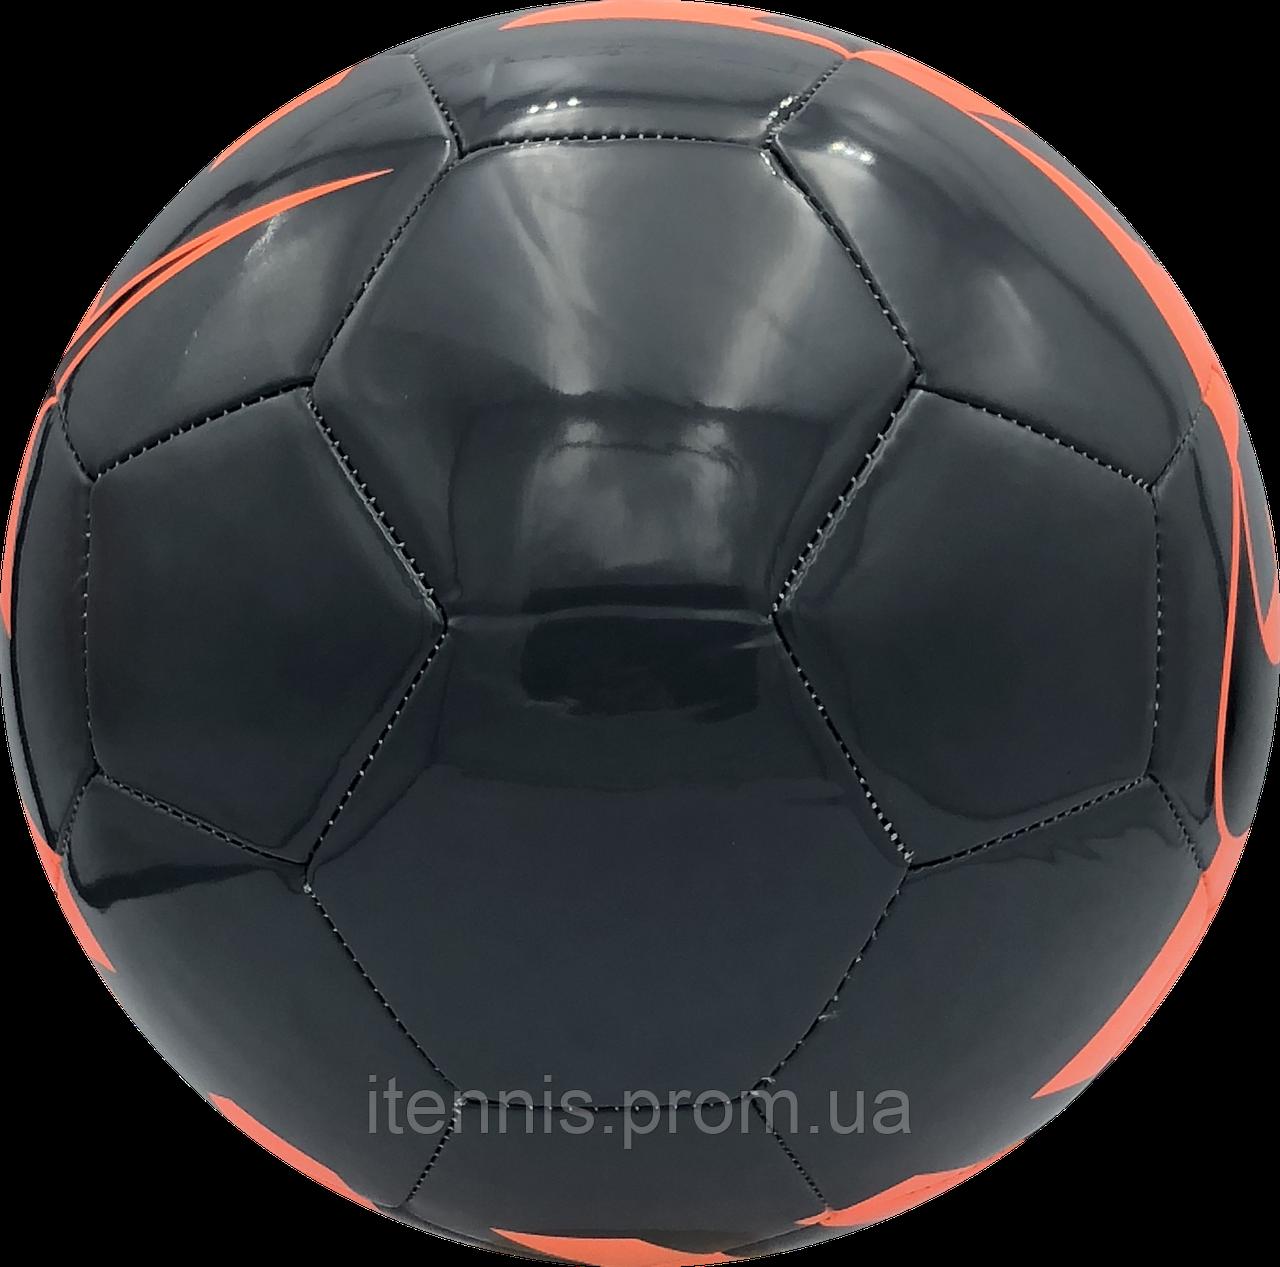 big sale fb2a9 20409 Футбольный мяч Nike HYPERVENOM / REACT Gray NEW! - Bigl.ua